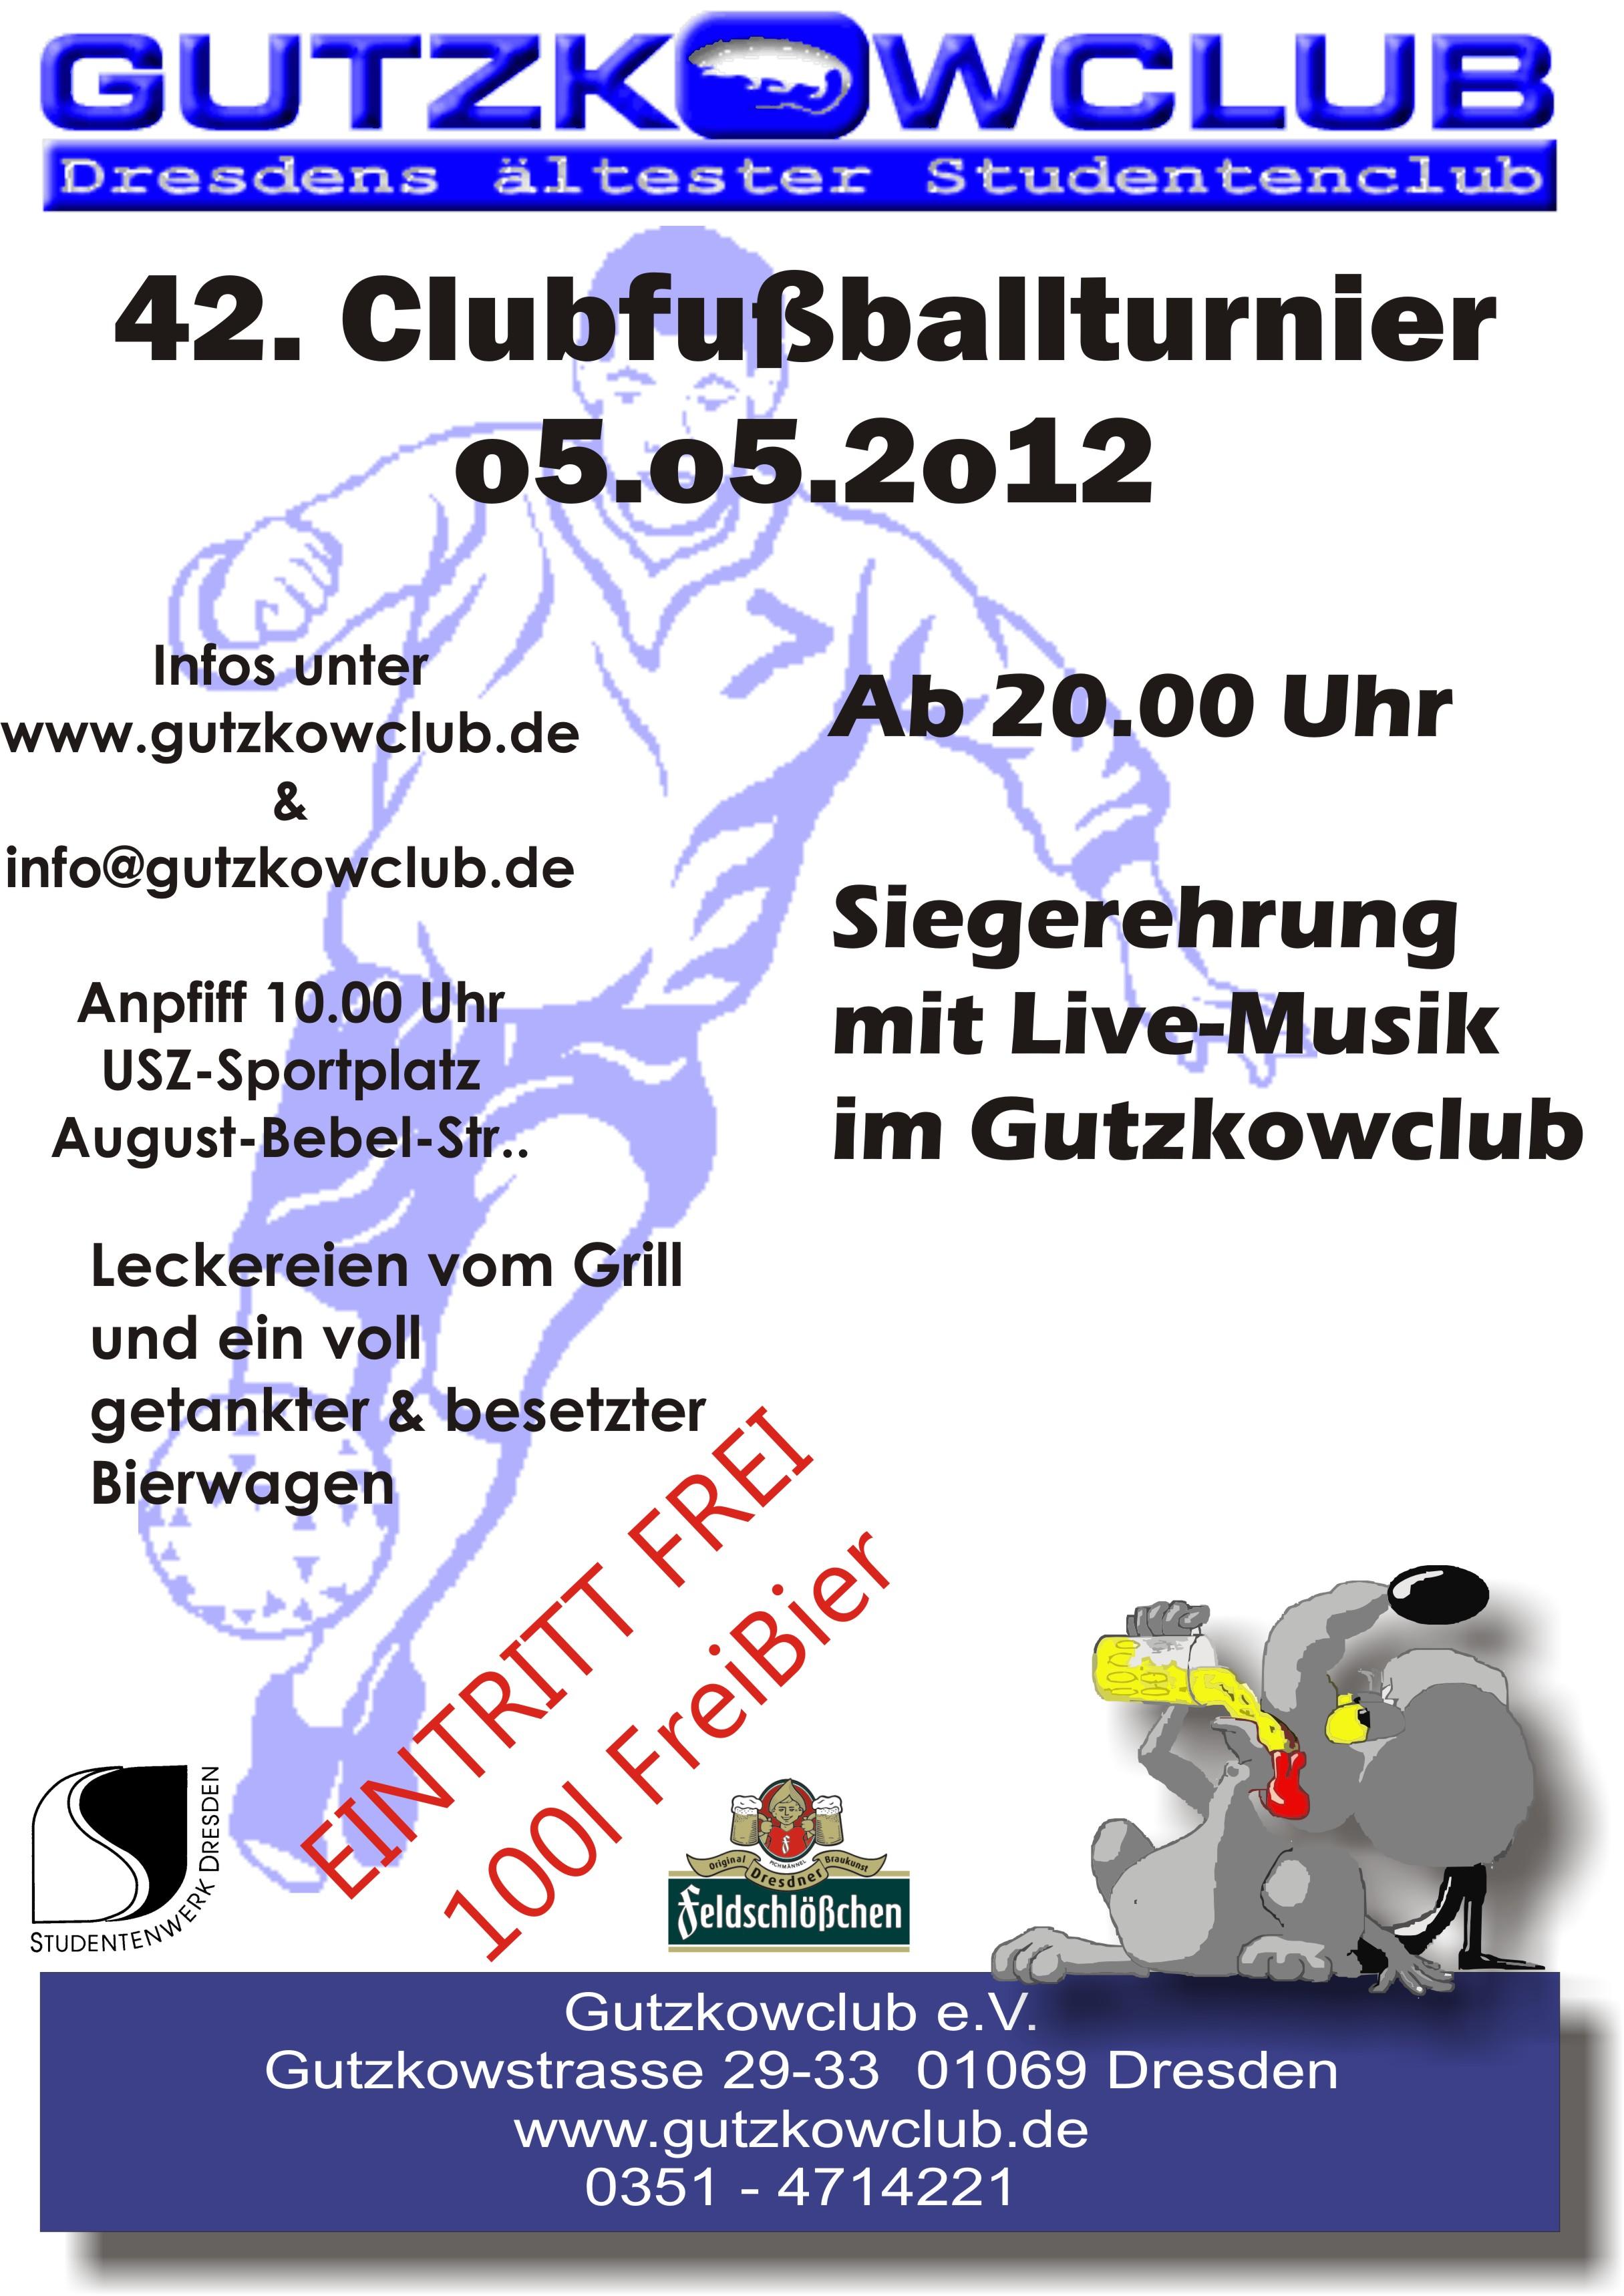 42. Clubfussballturnier